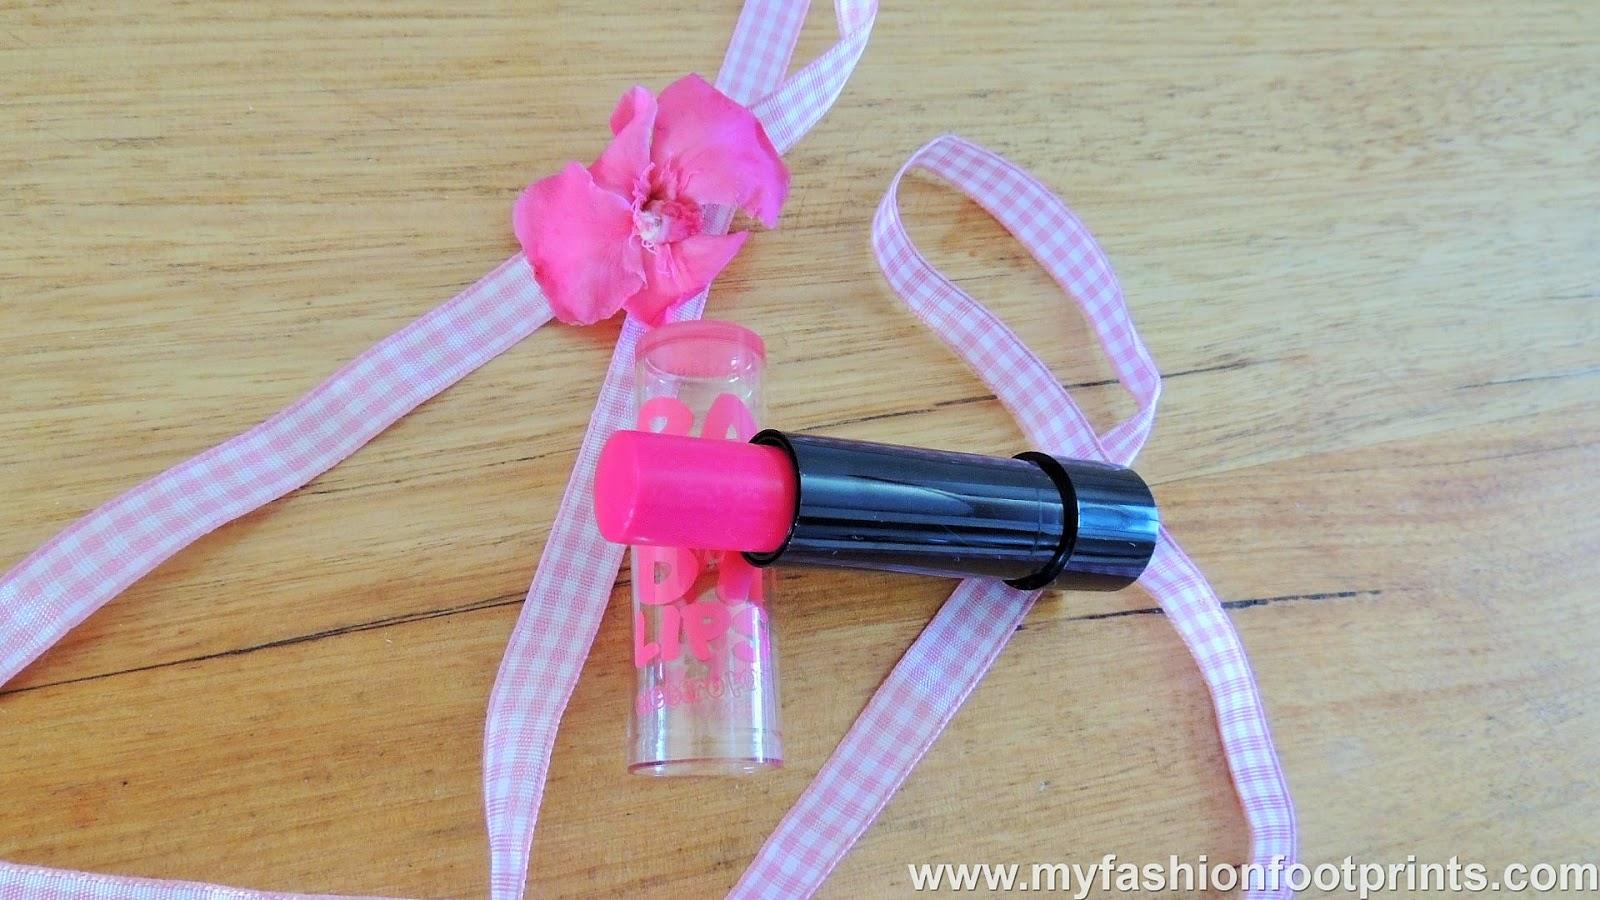 Maybelline Baby Lips Electro Pop Lip Balm - Pink Shock